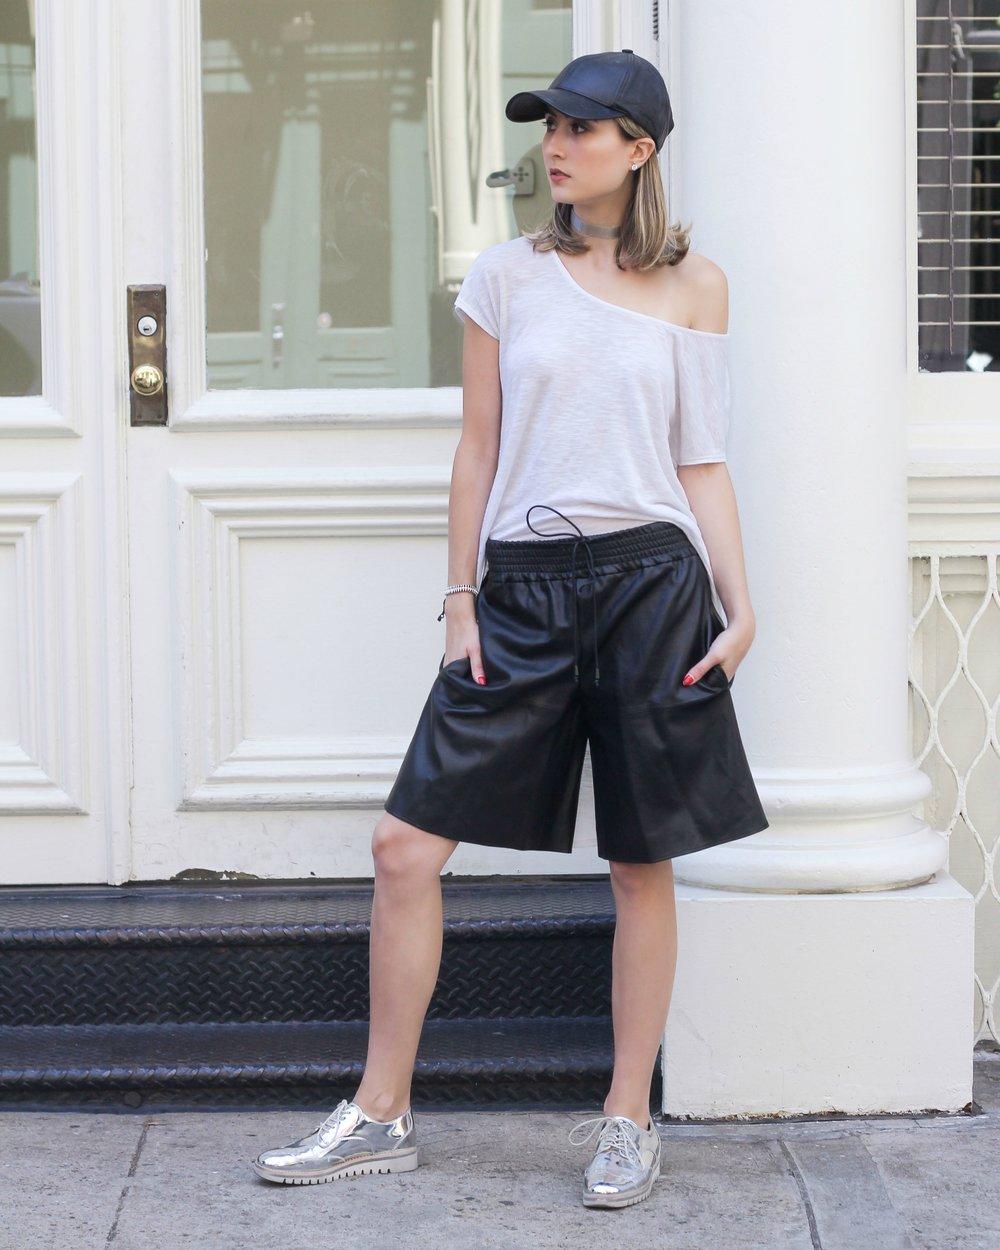 Leather Shorts-2.jpg